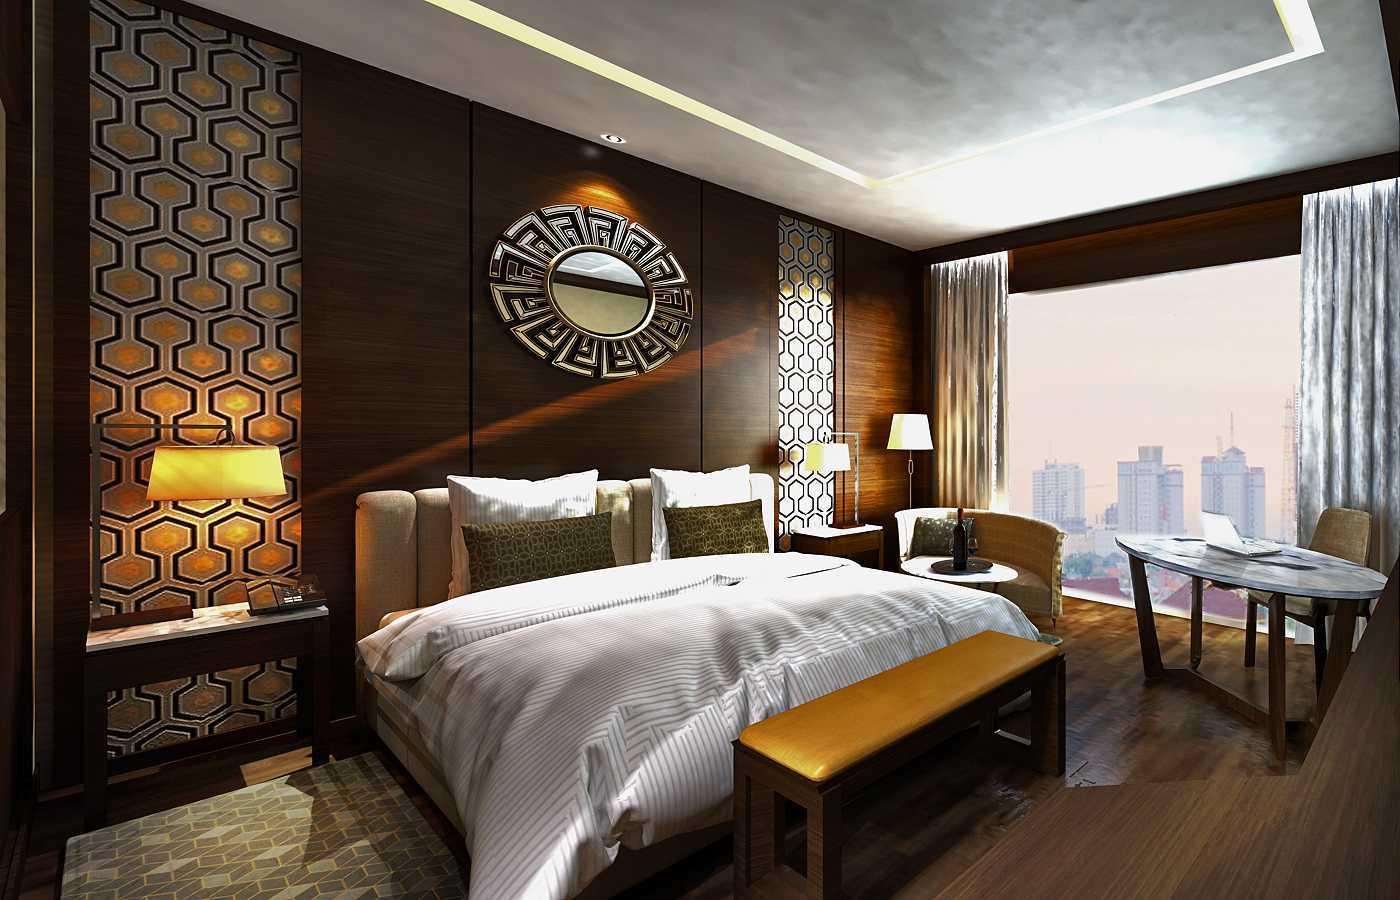 Rinto Katili Hotel Unit Surabaya Surabaya Hotel_Room Unit_View To Bedroom Kontemporer 29771